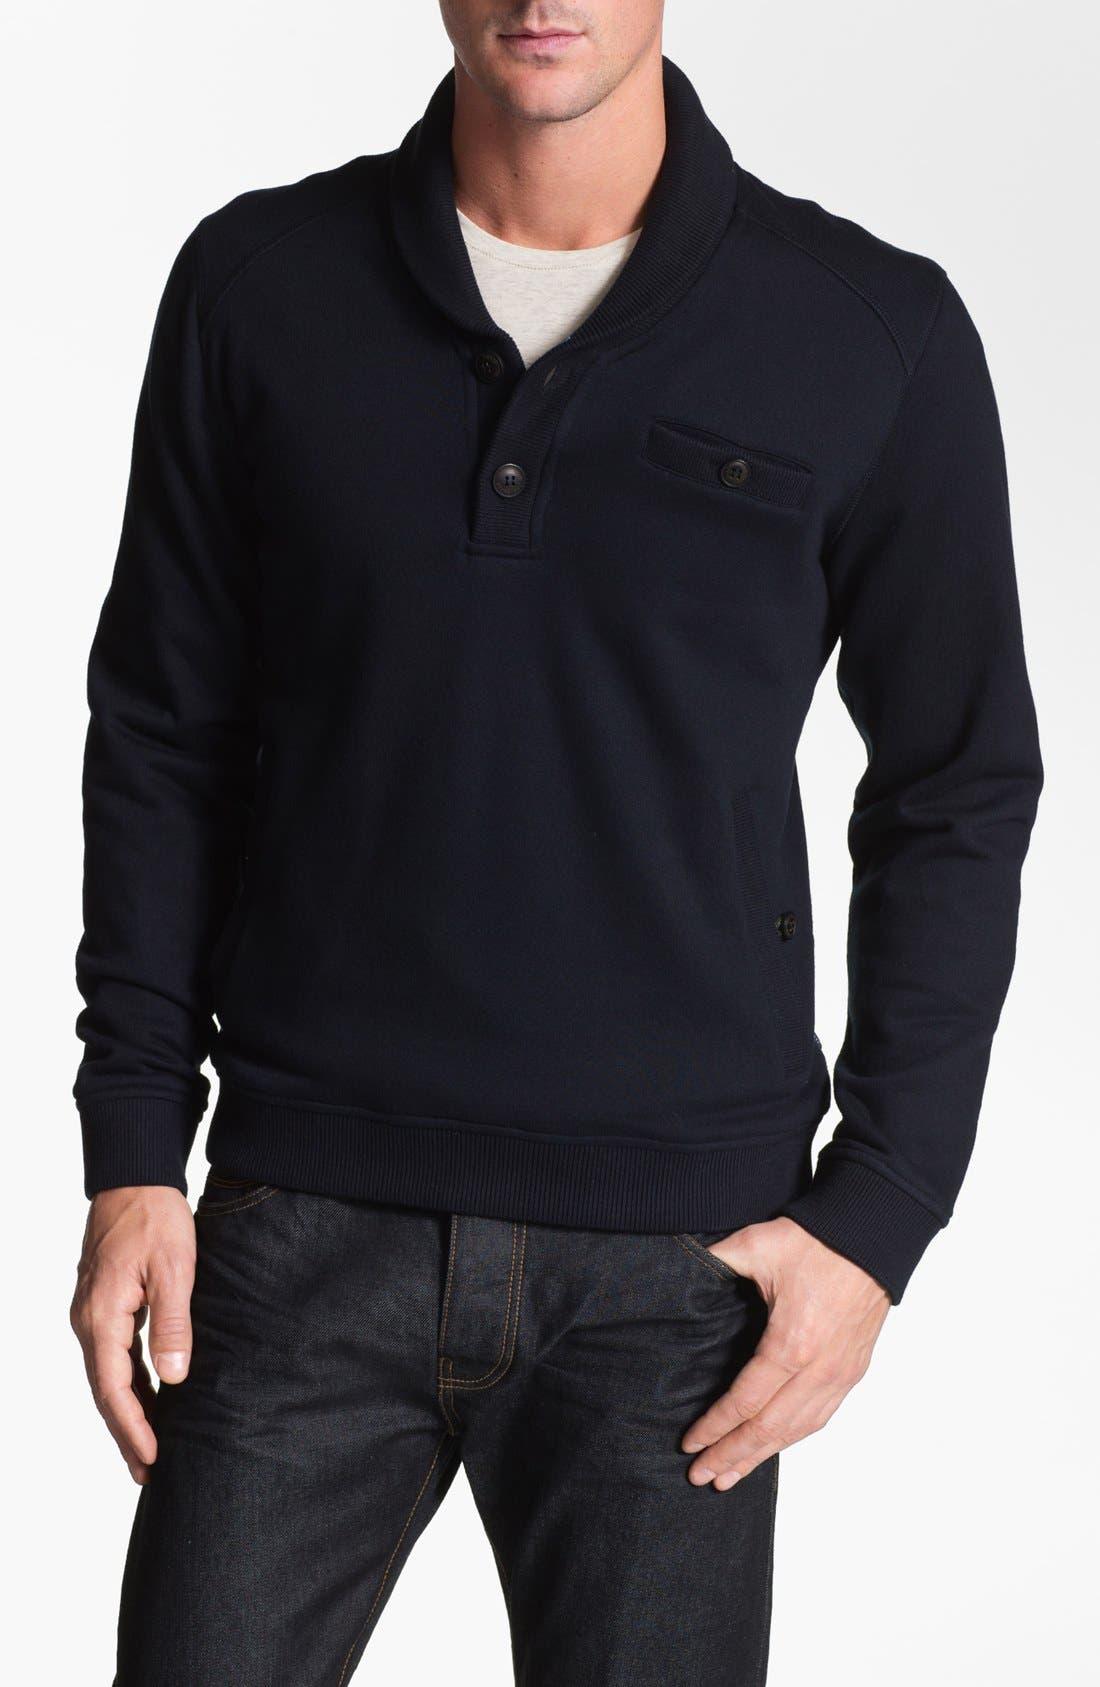 Main Image - Ted Baker London 'Norush' Shawl Collar Sweatshirt